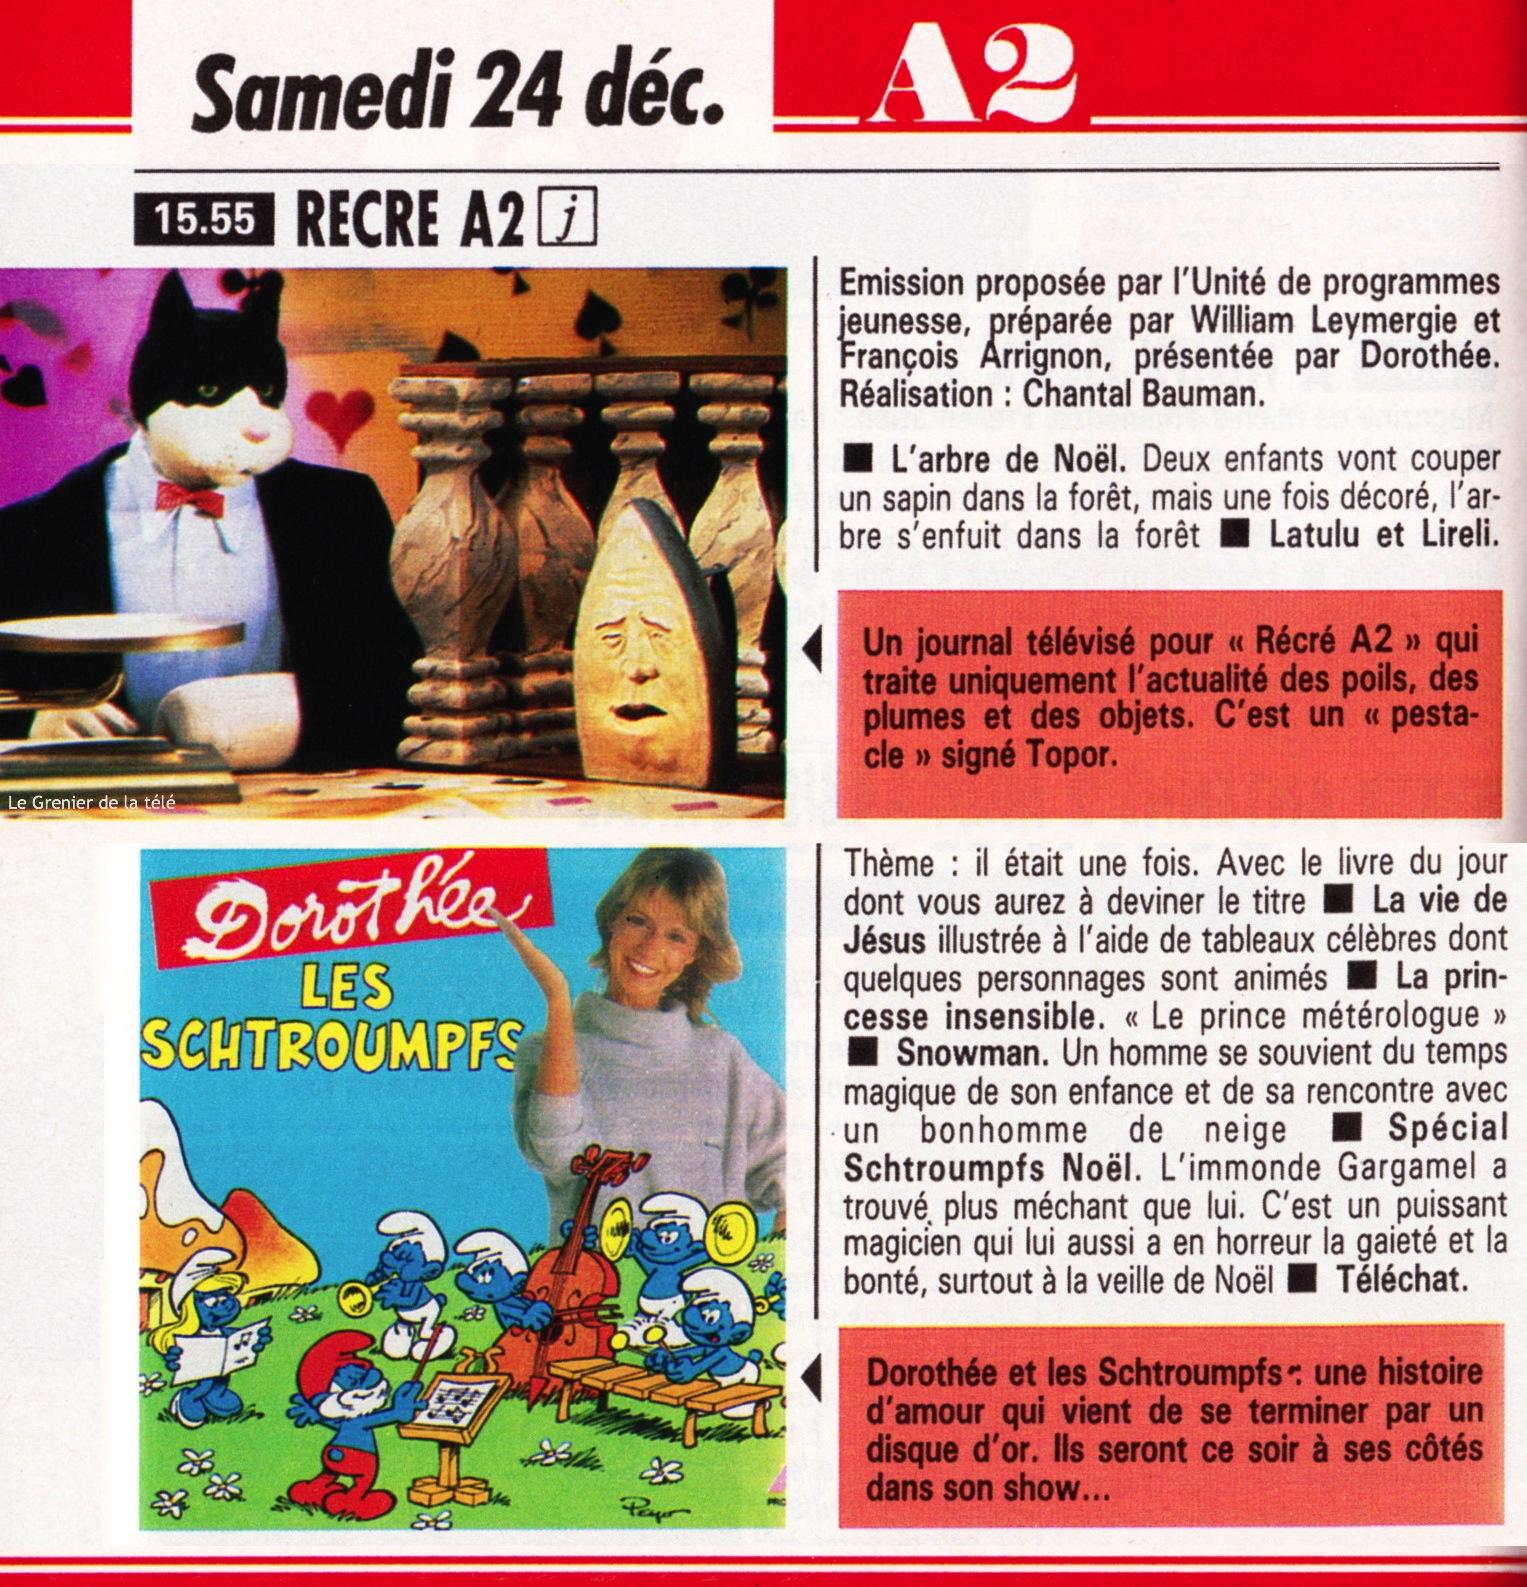 http://grenierdelatv.free.fr/recrea224decembre1983.jpg